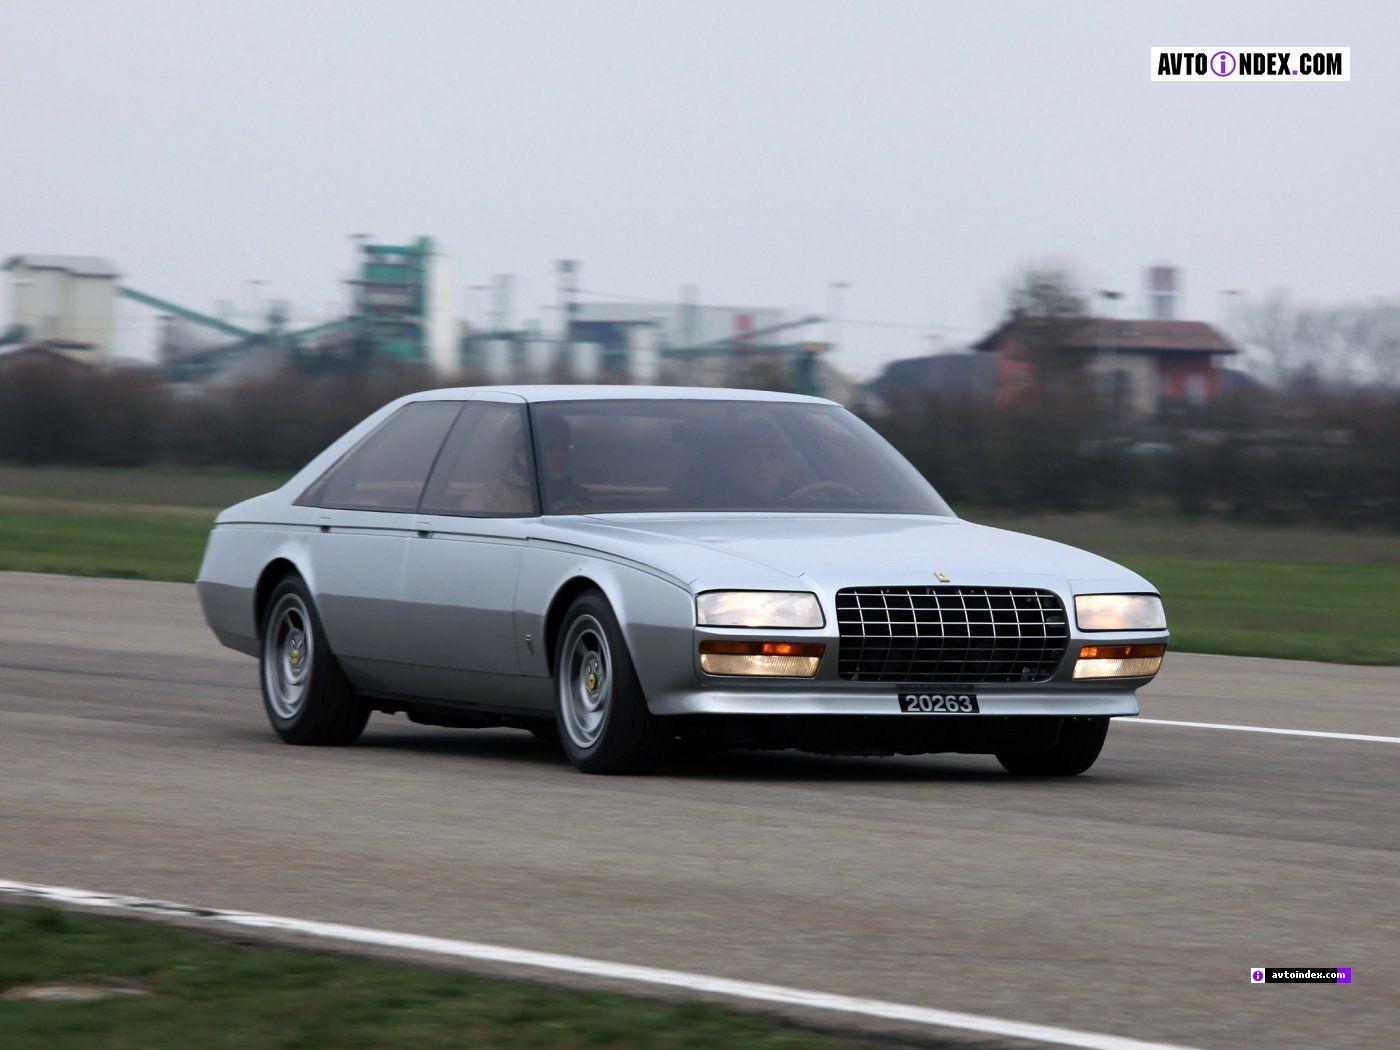 Ferrari Pinin Concept (1980)